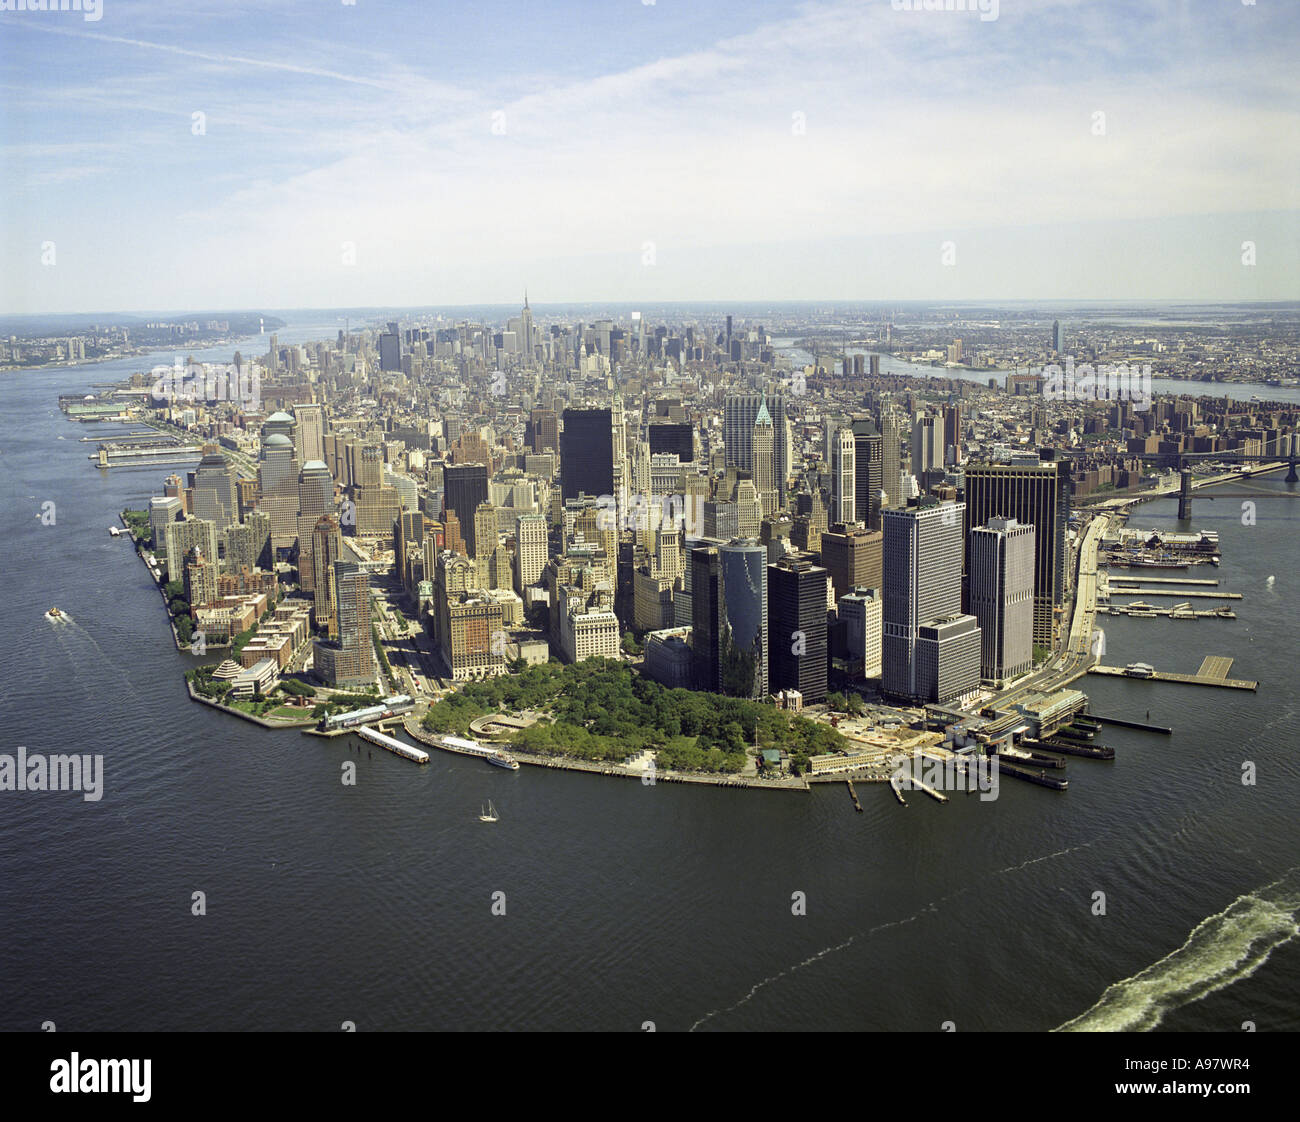 Manhattan New York New York: Aerial View Of Lower Manhattan, New York City, U.S.A